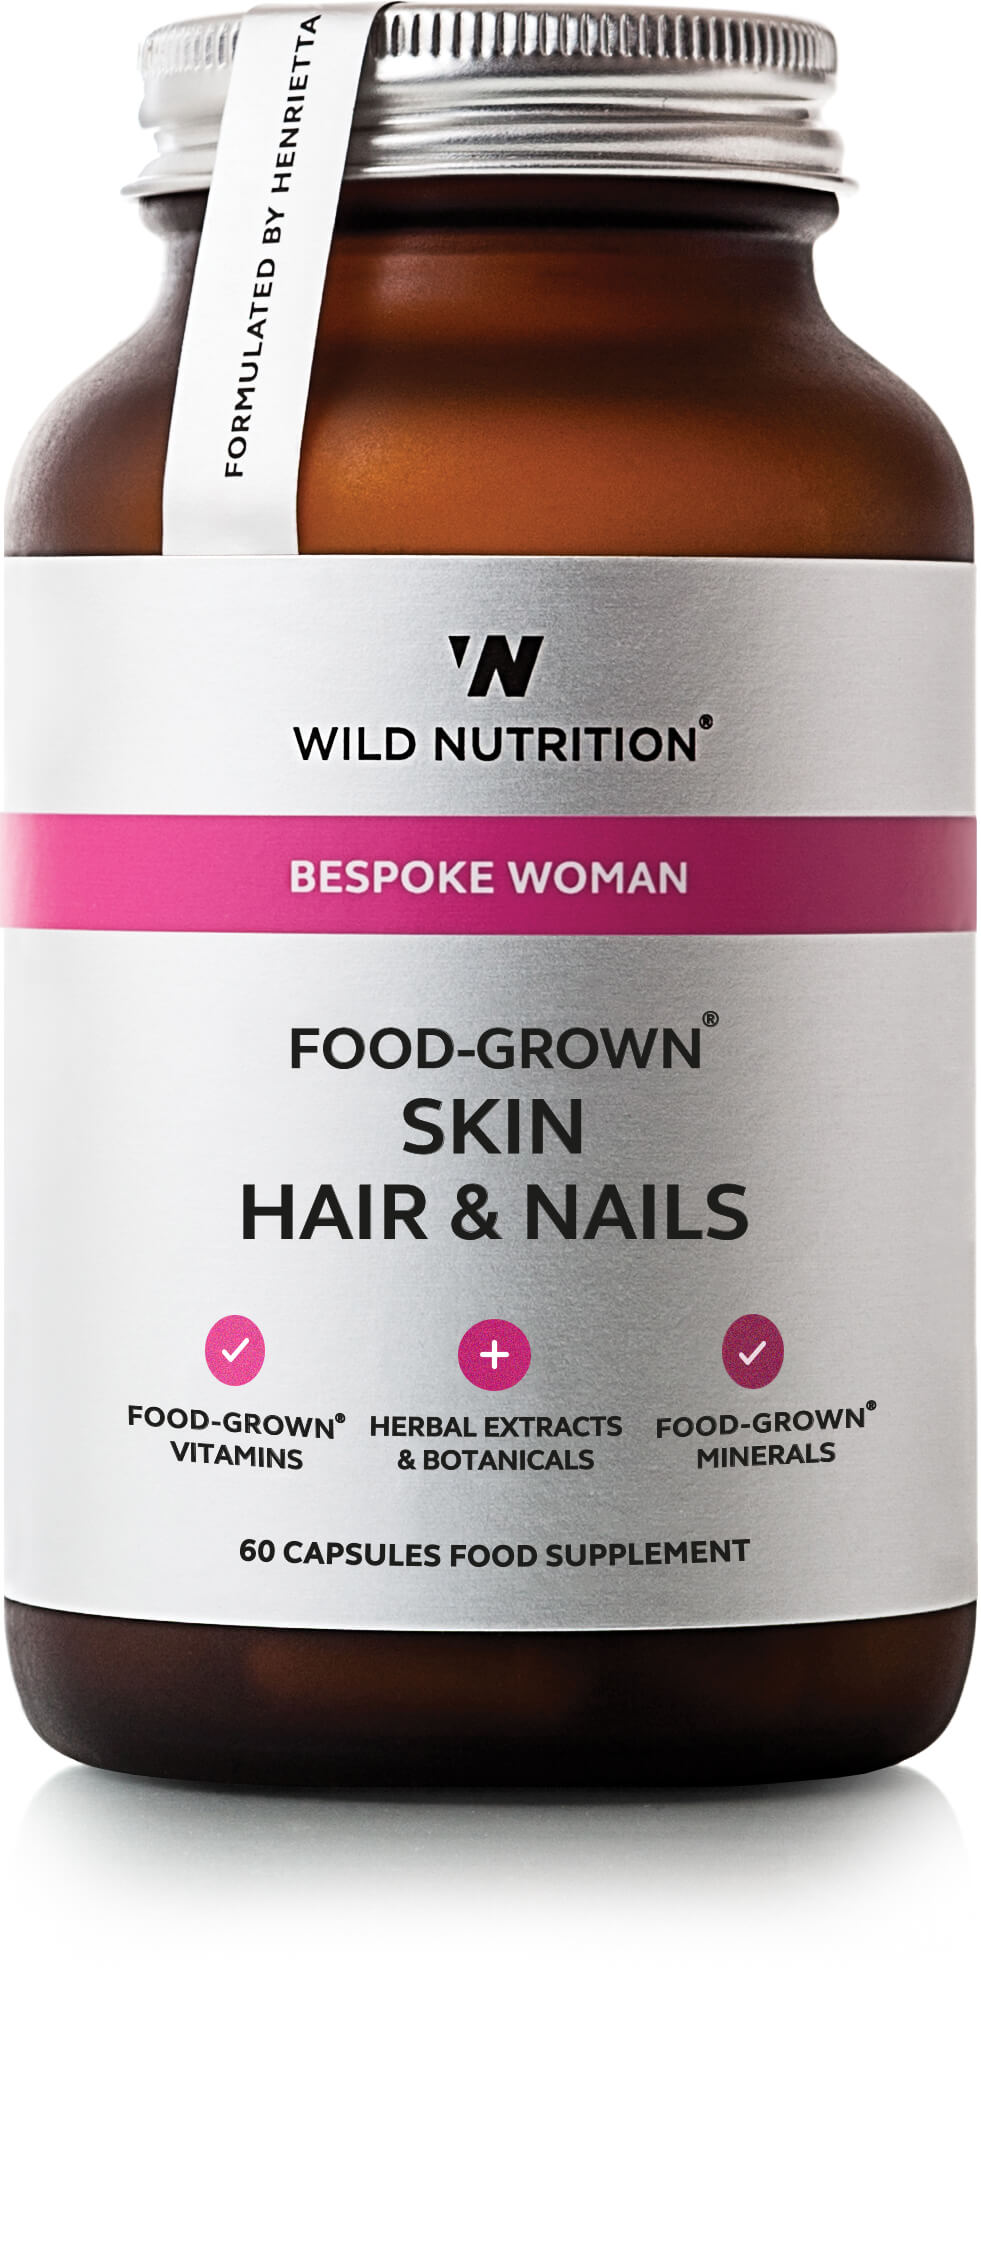 Bespoke Woman Food-Grown Skin Hair & Nails 60's